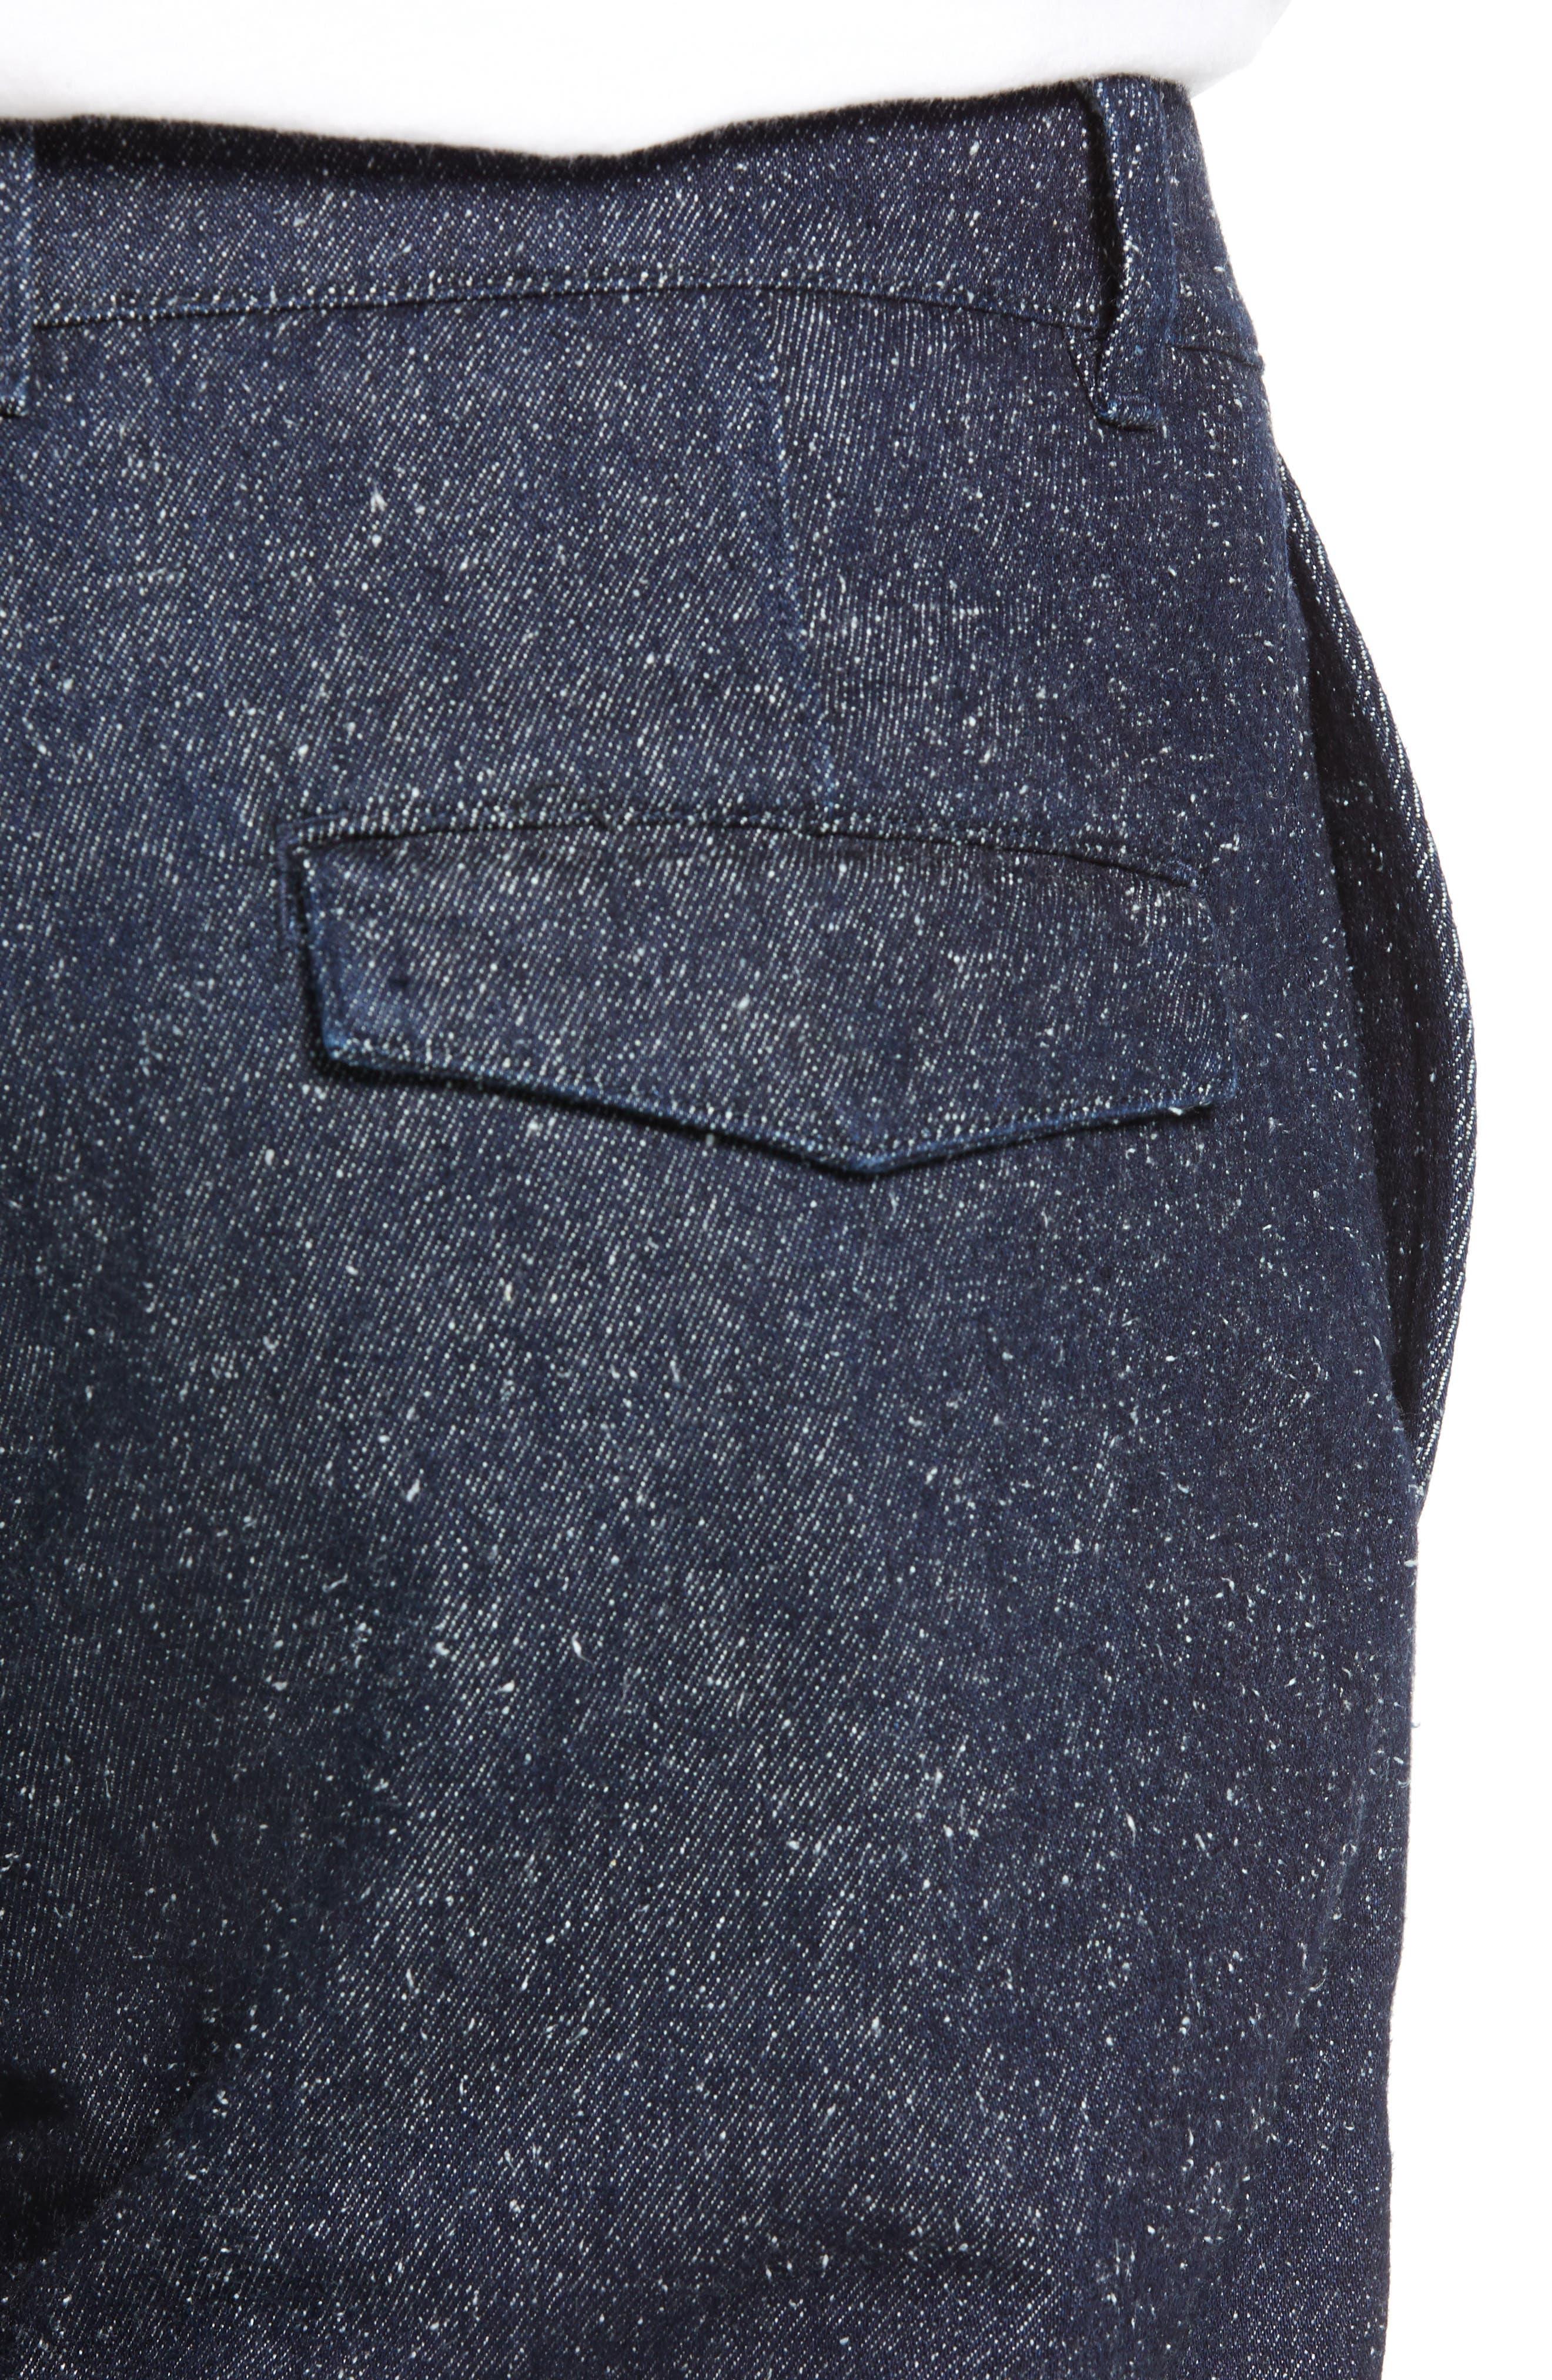 Tapered Straight Leg Cotton & Silk Trousers,                             Alternate thumbnail 4, color,                             NEPPY DENIM